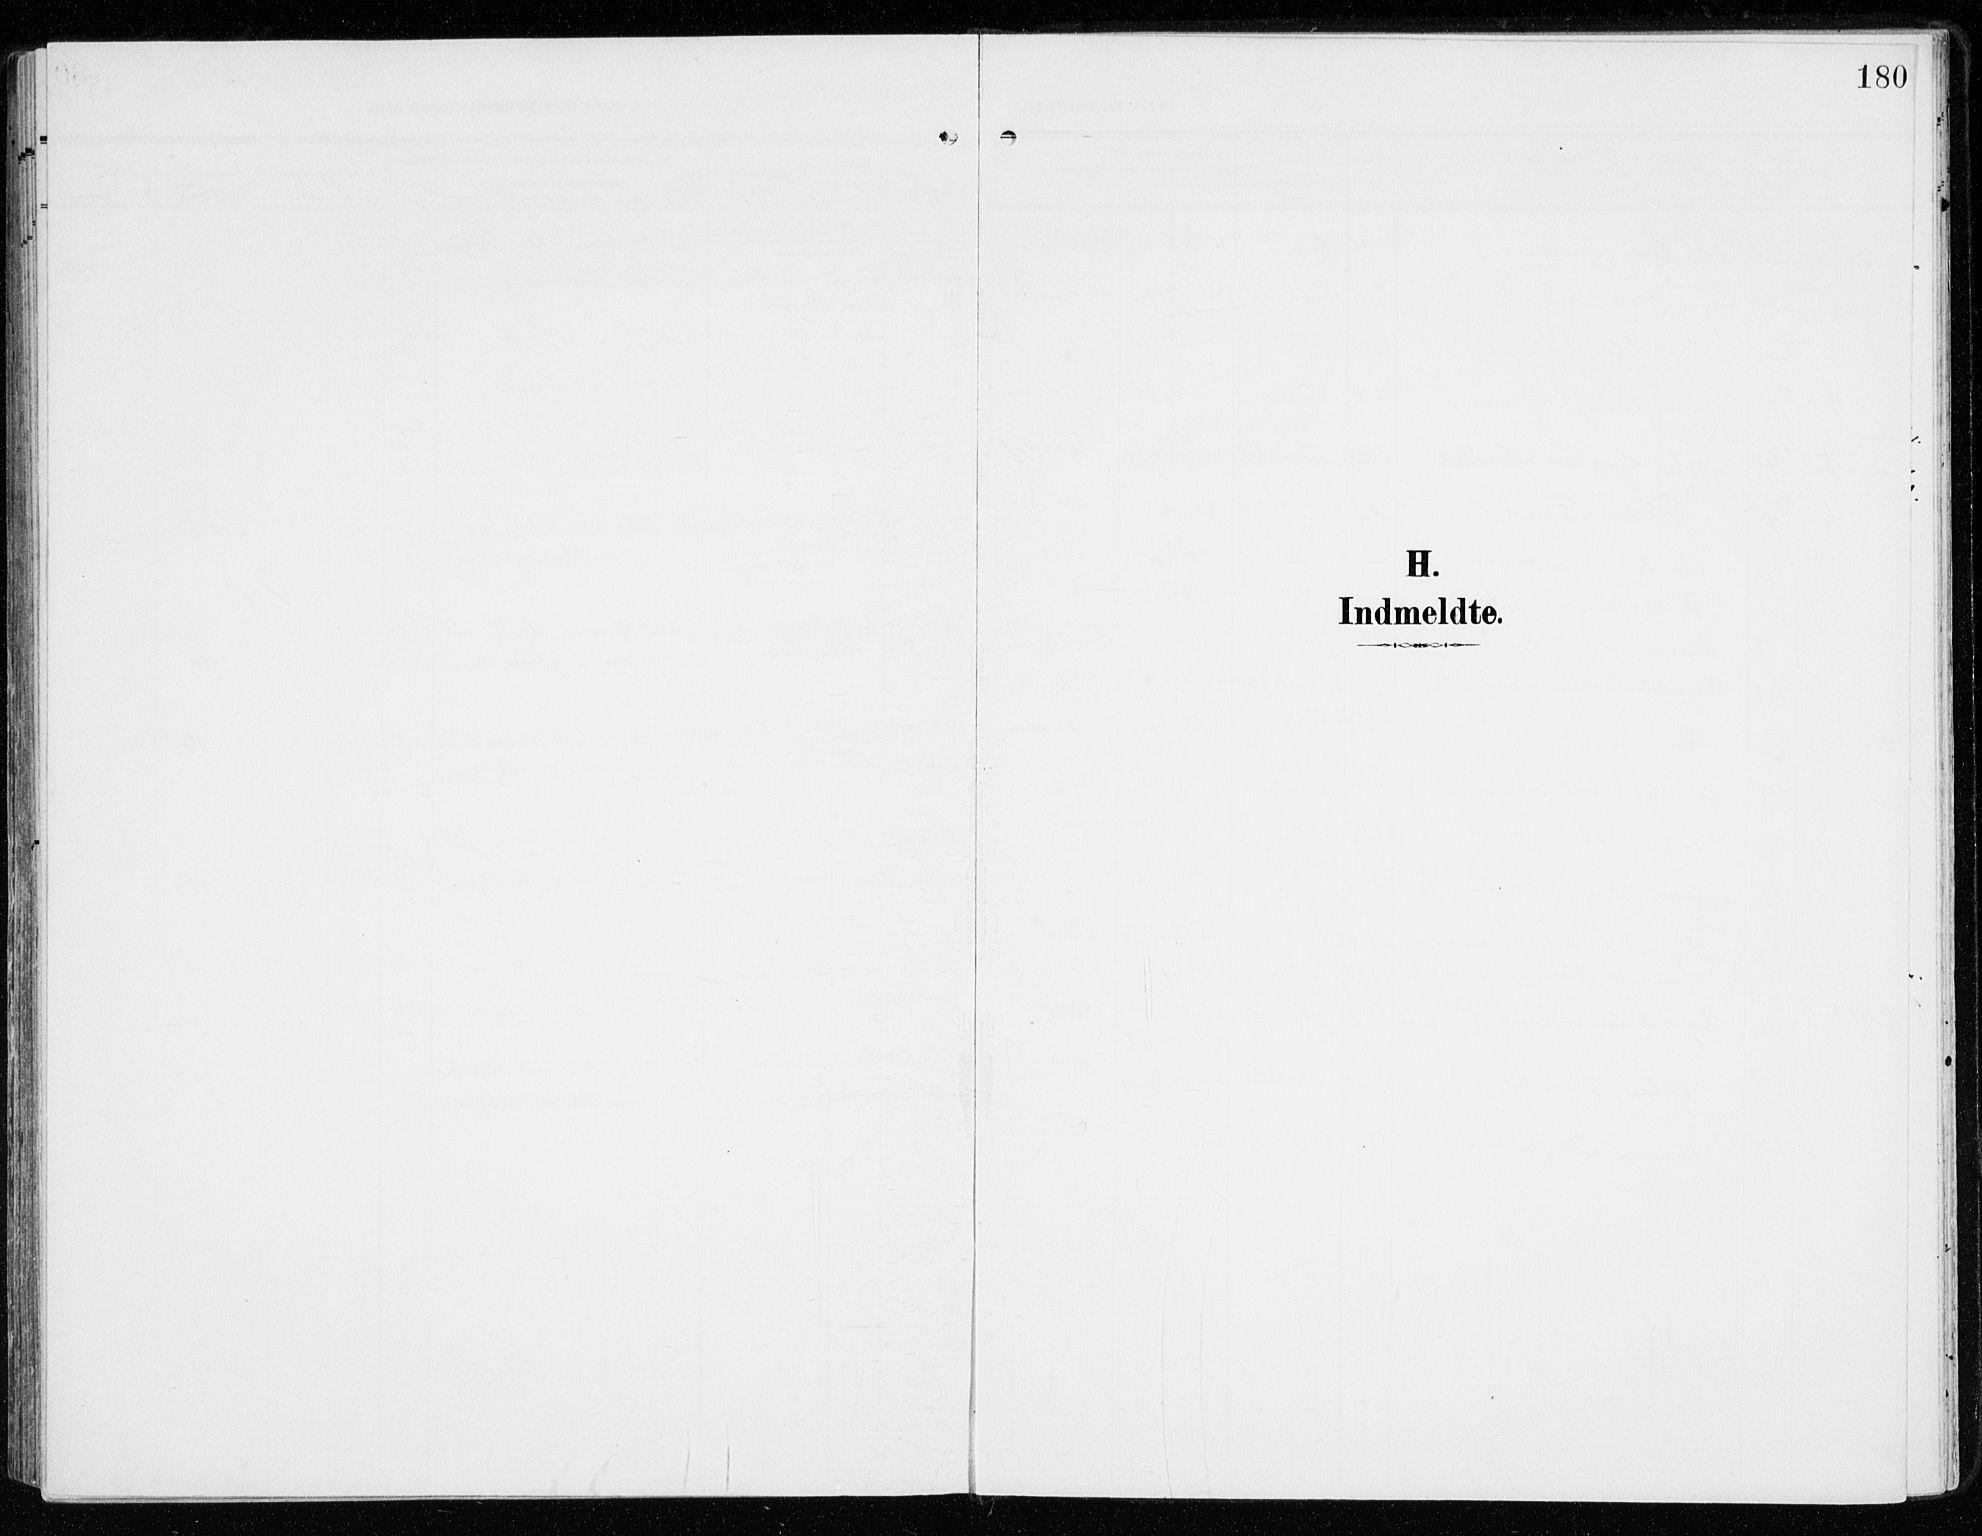 SAH, Sel prestekontor, Ministerialbok nr. 2, 1905-1919, s. 180